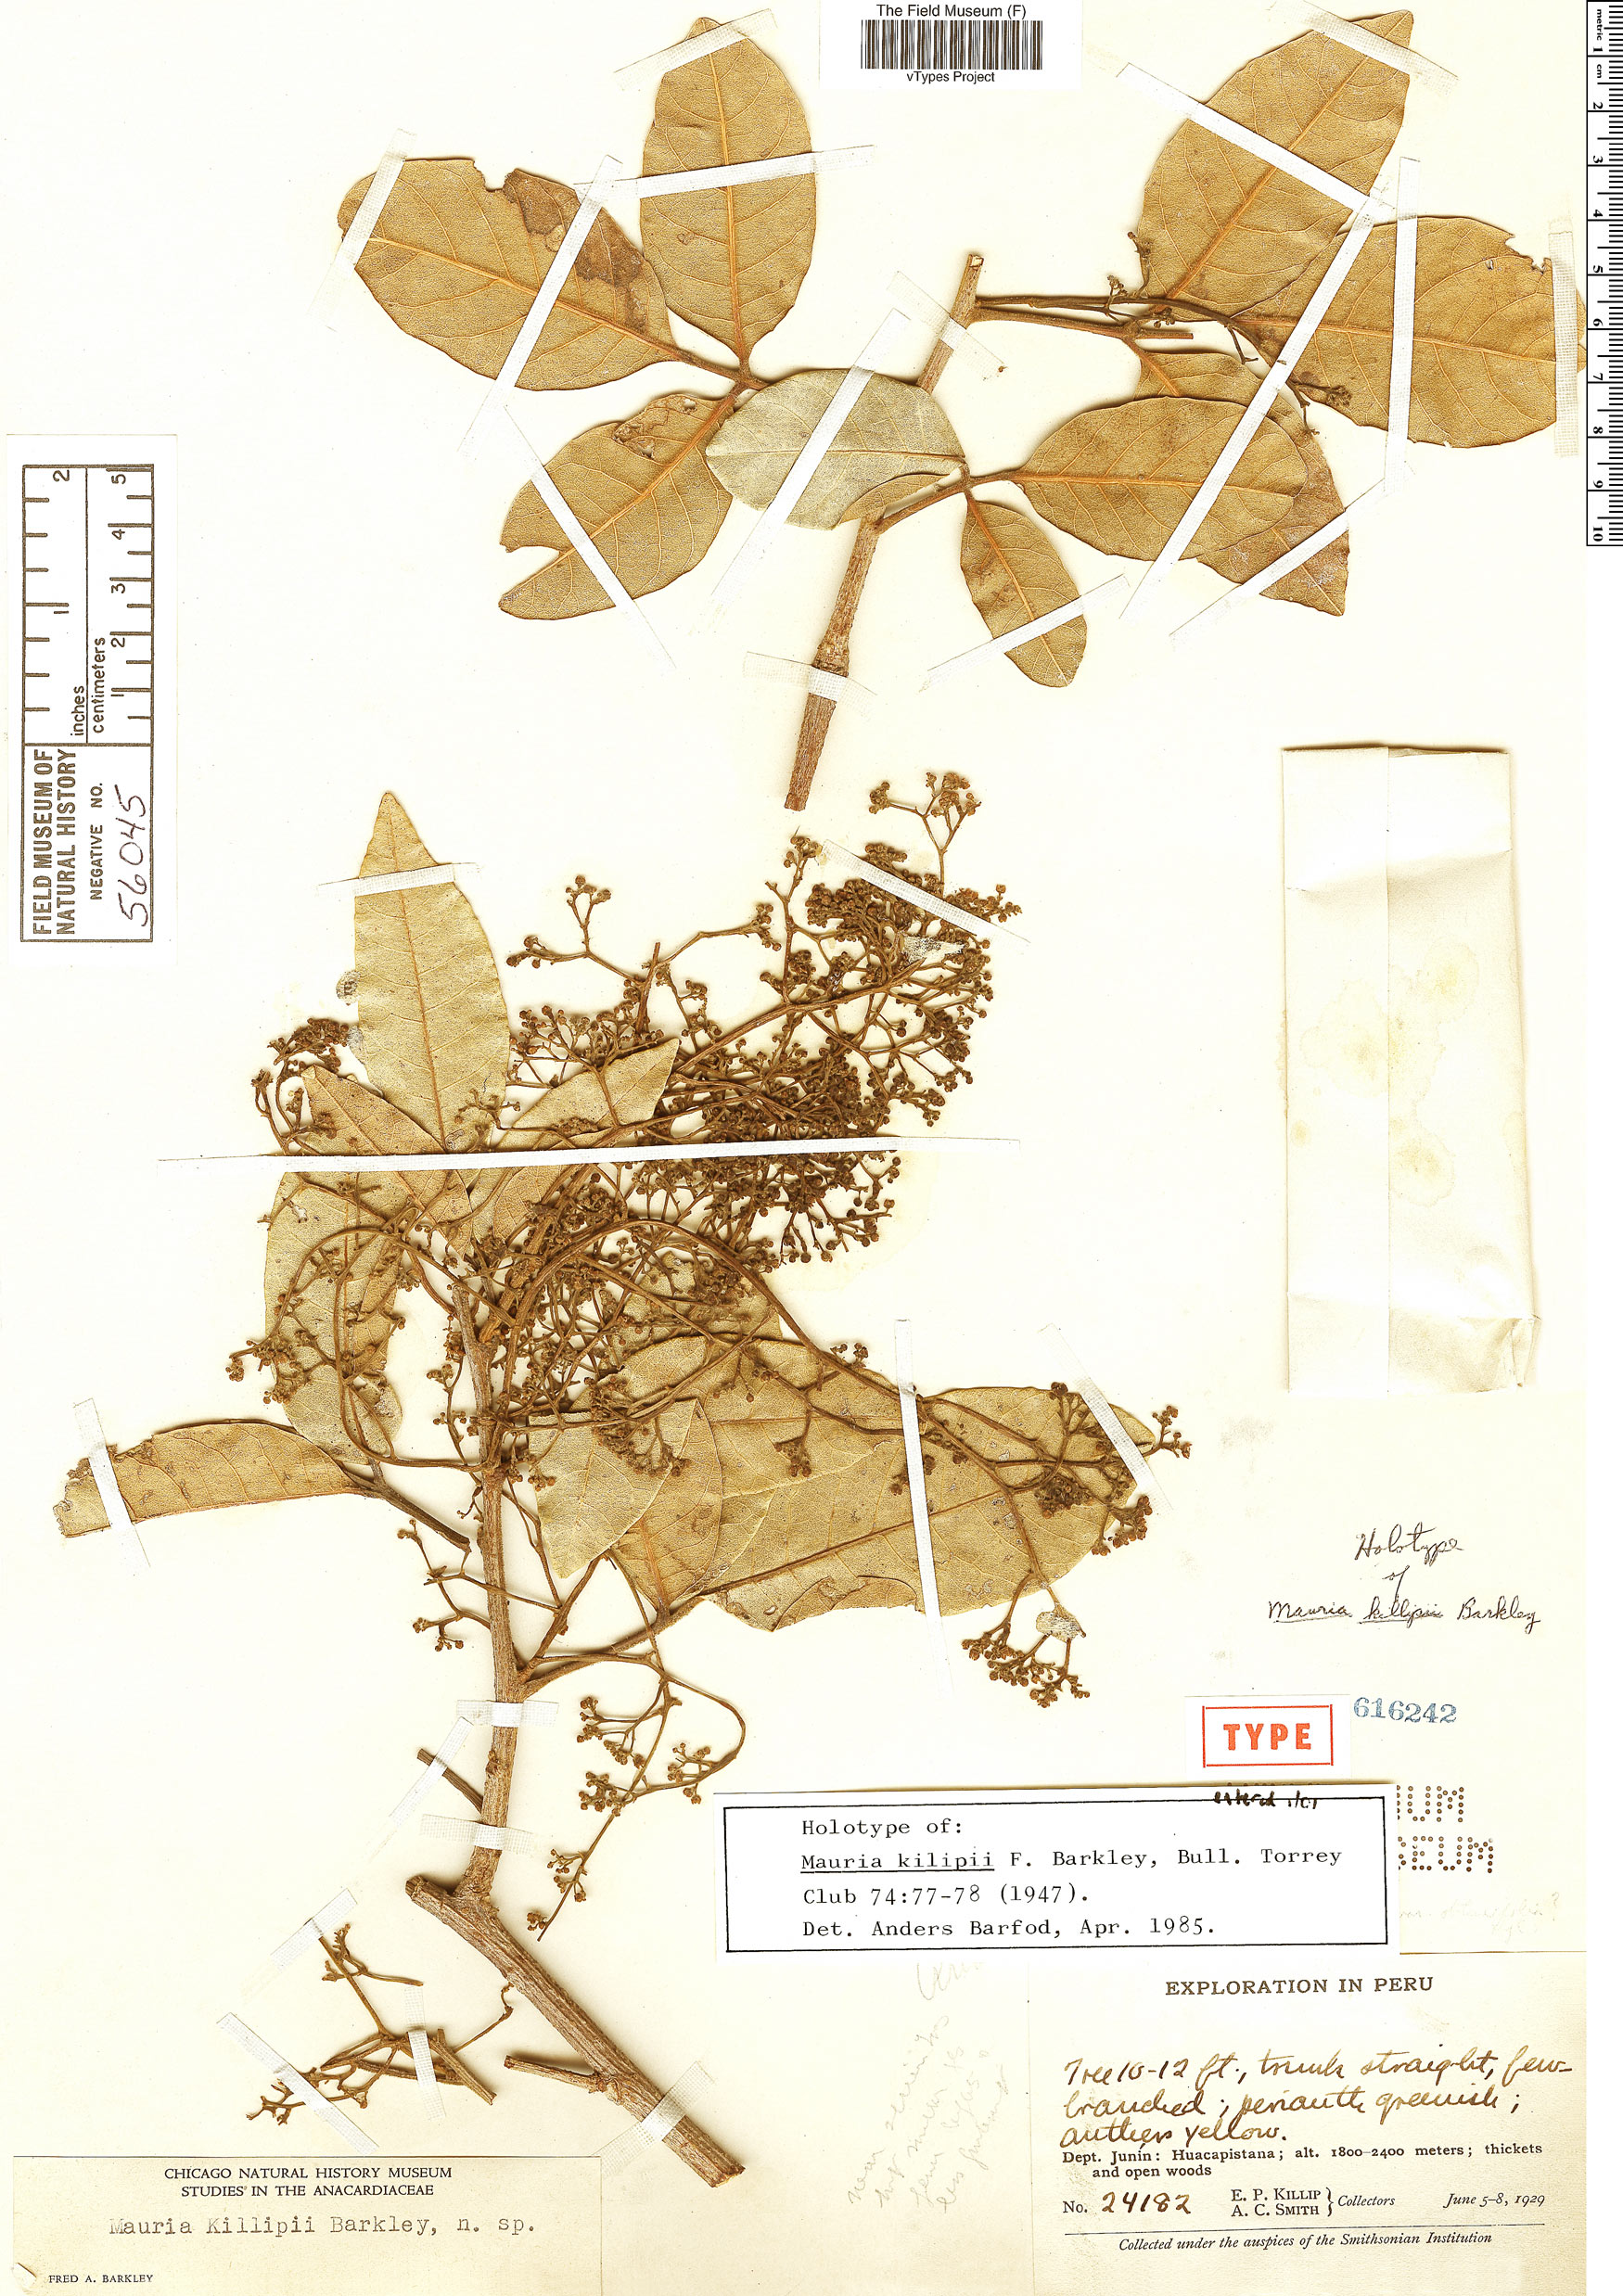 Specimen: Mauria killipii